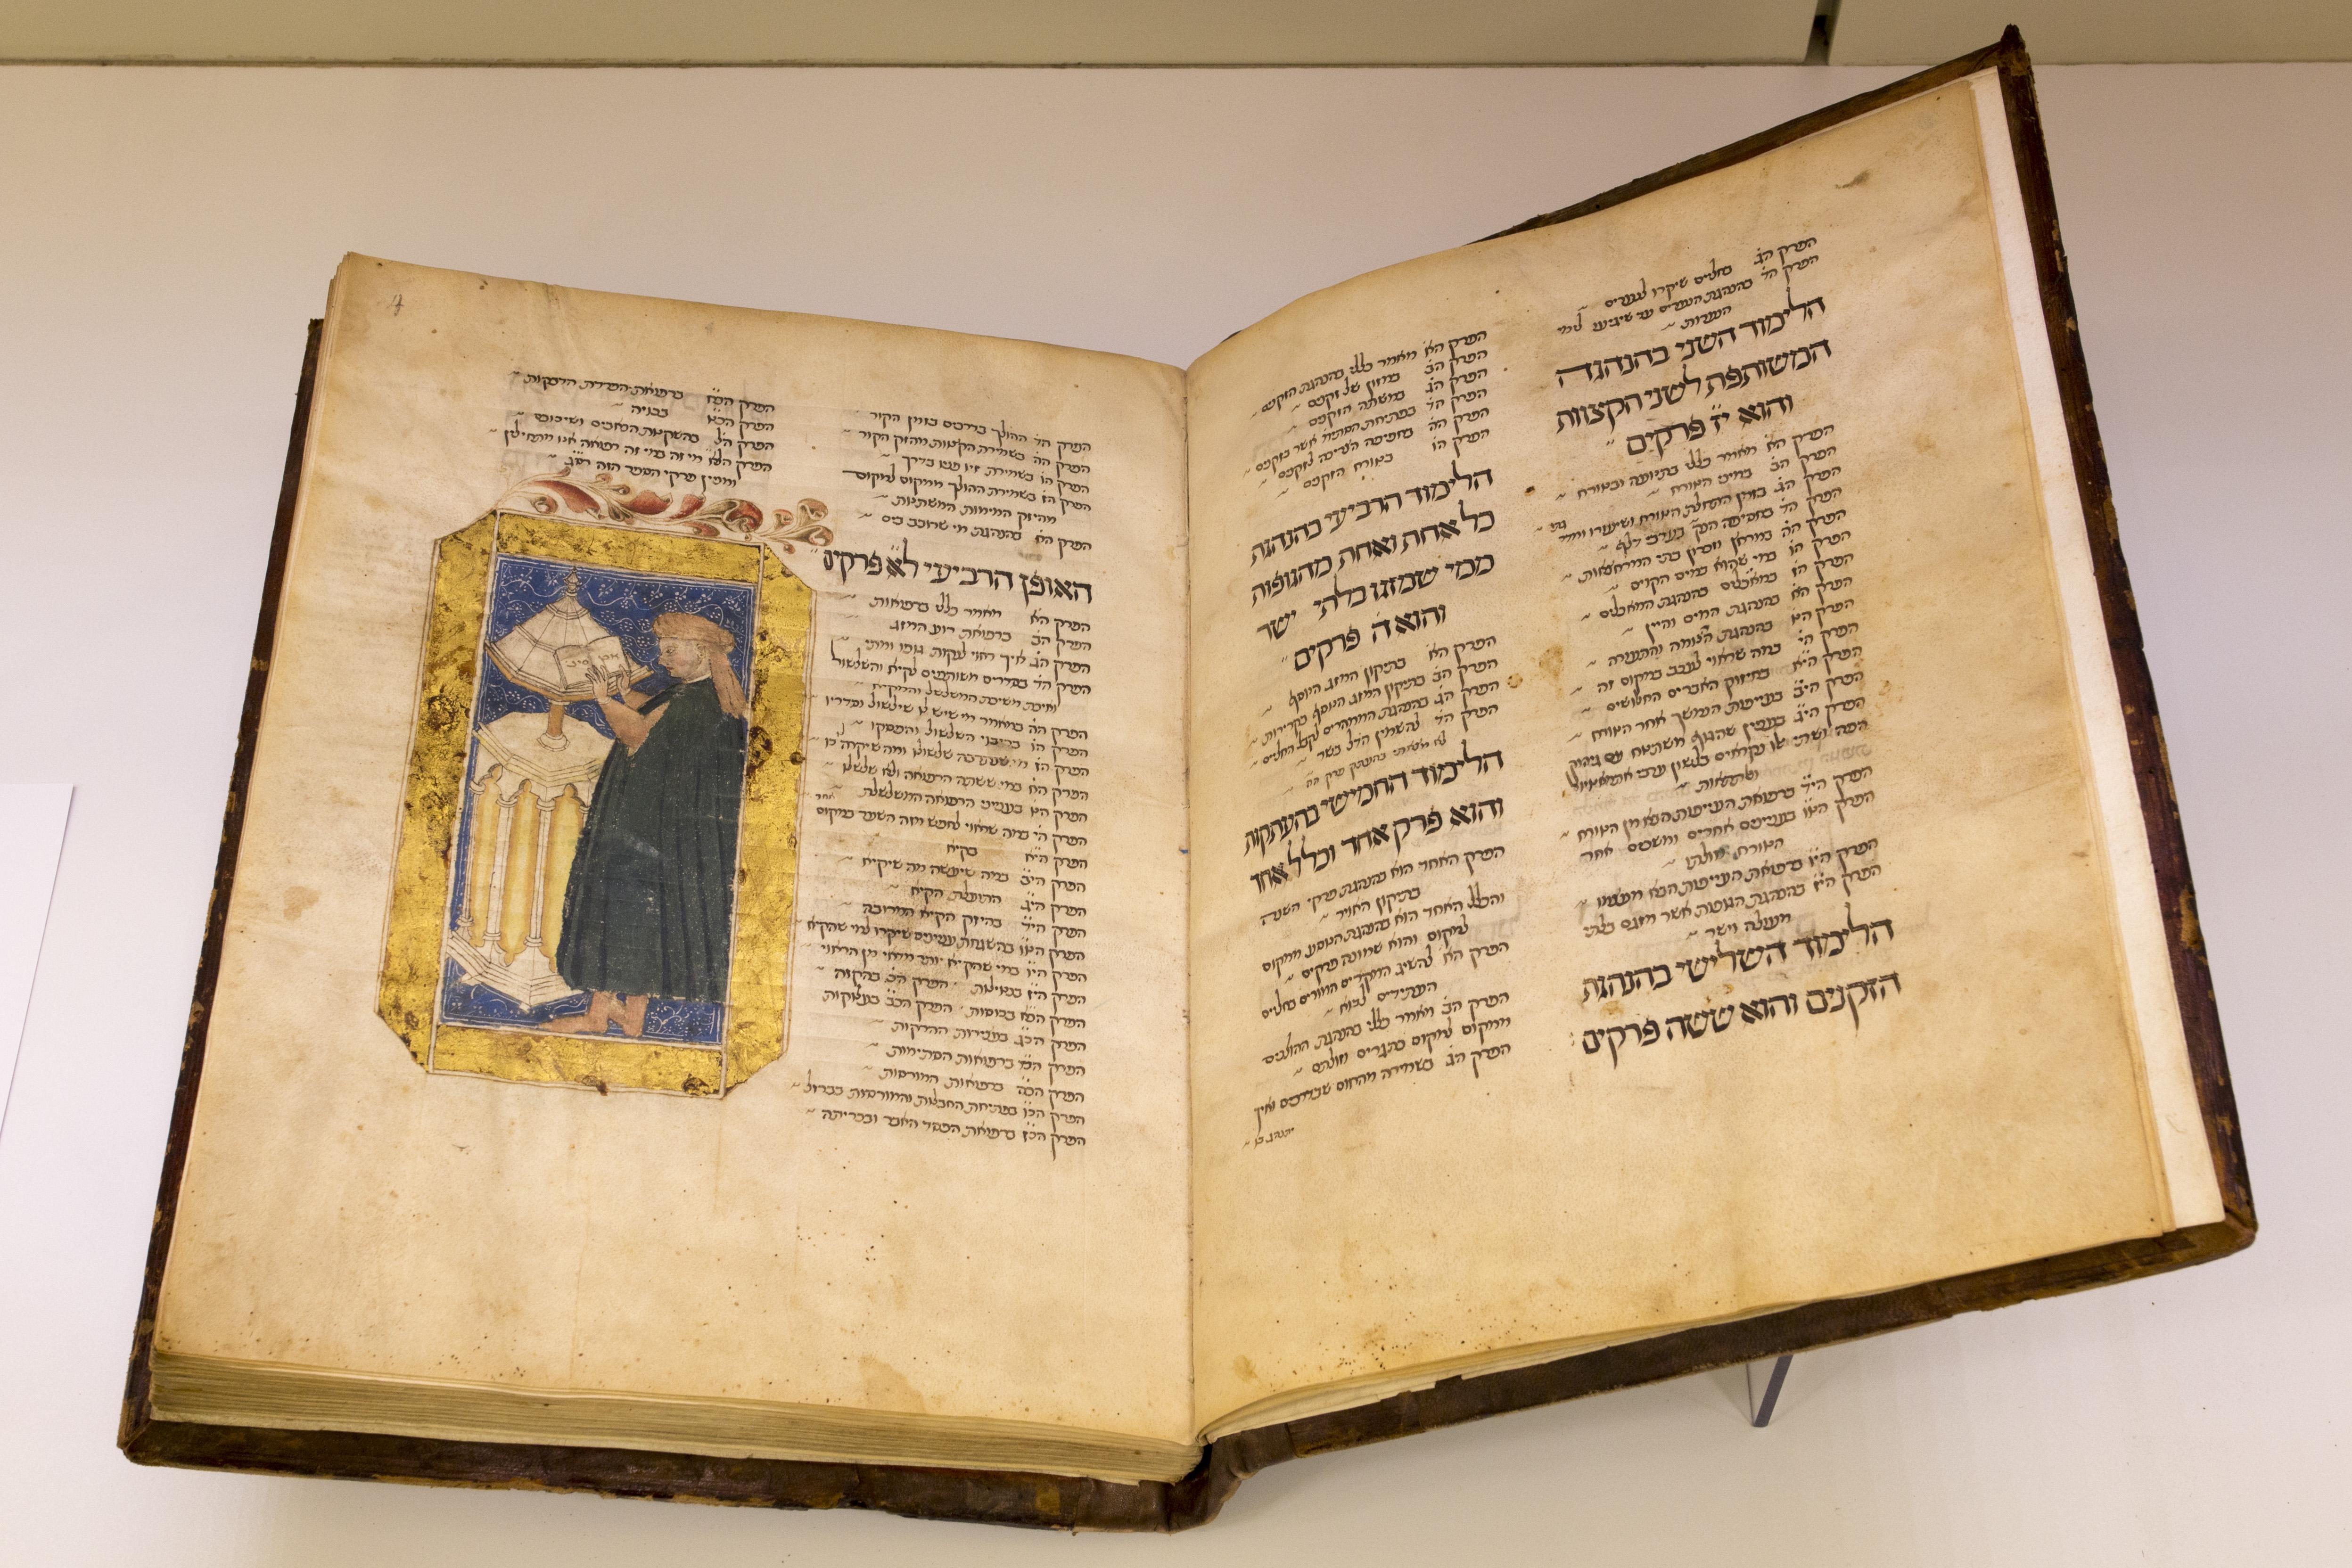 Biblioteca Universitaria di Bologna, Ebraici; ms. 2297